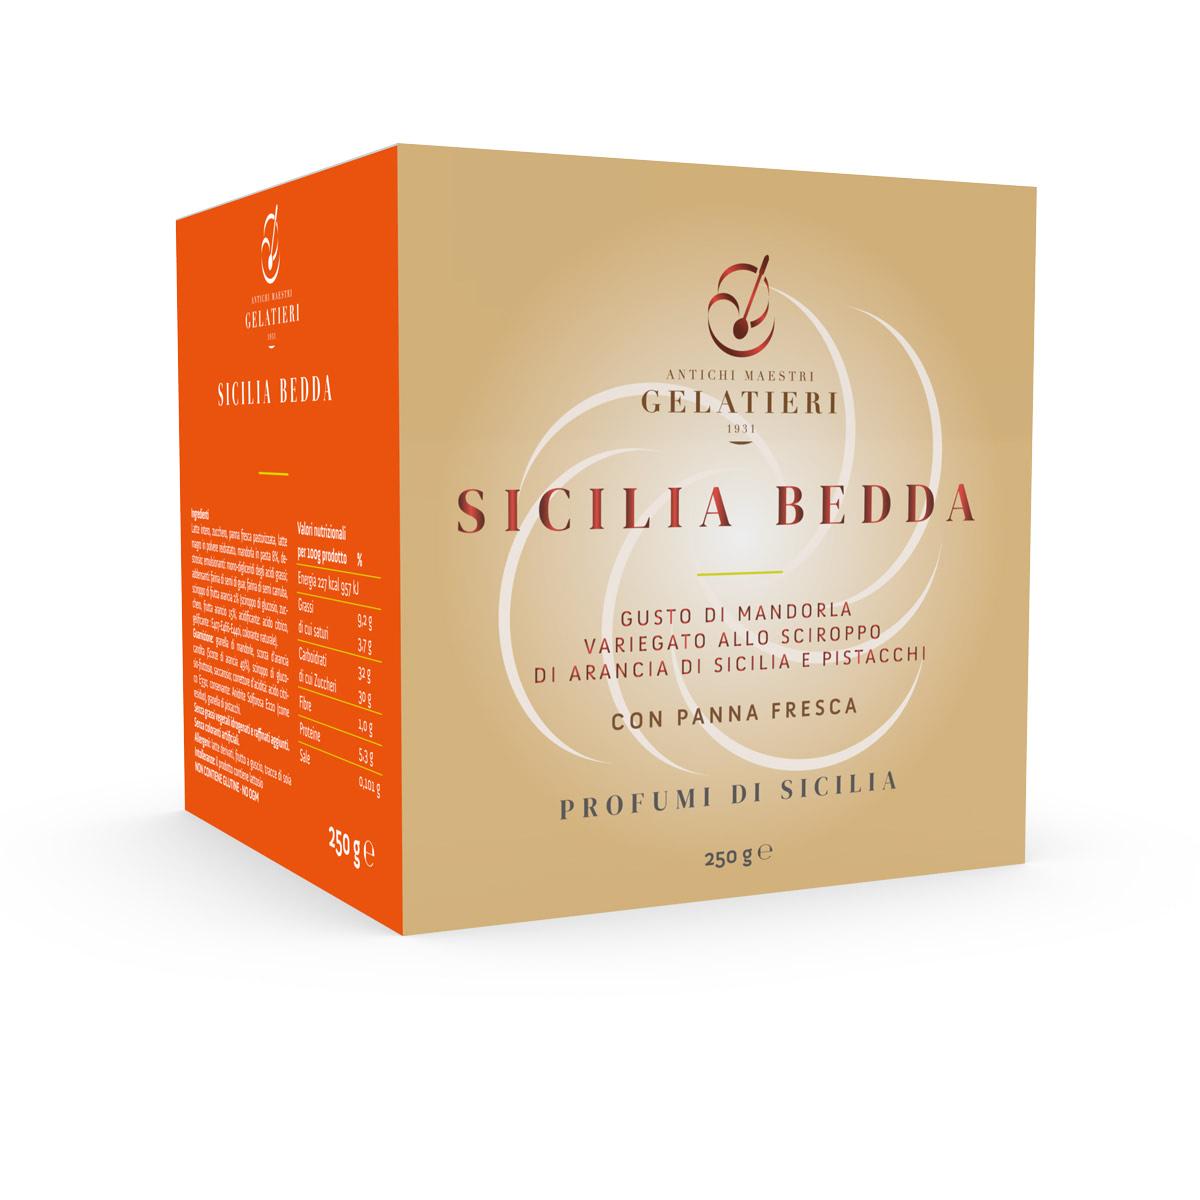 cubotti sicilia bedda - antichi maestri gelatieri